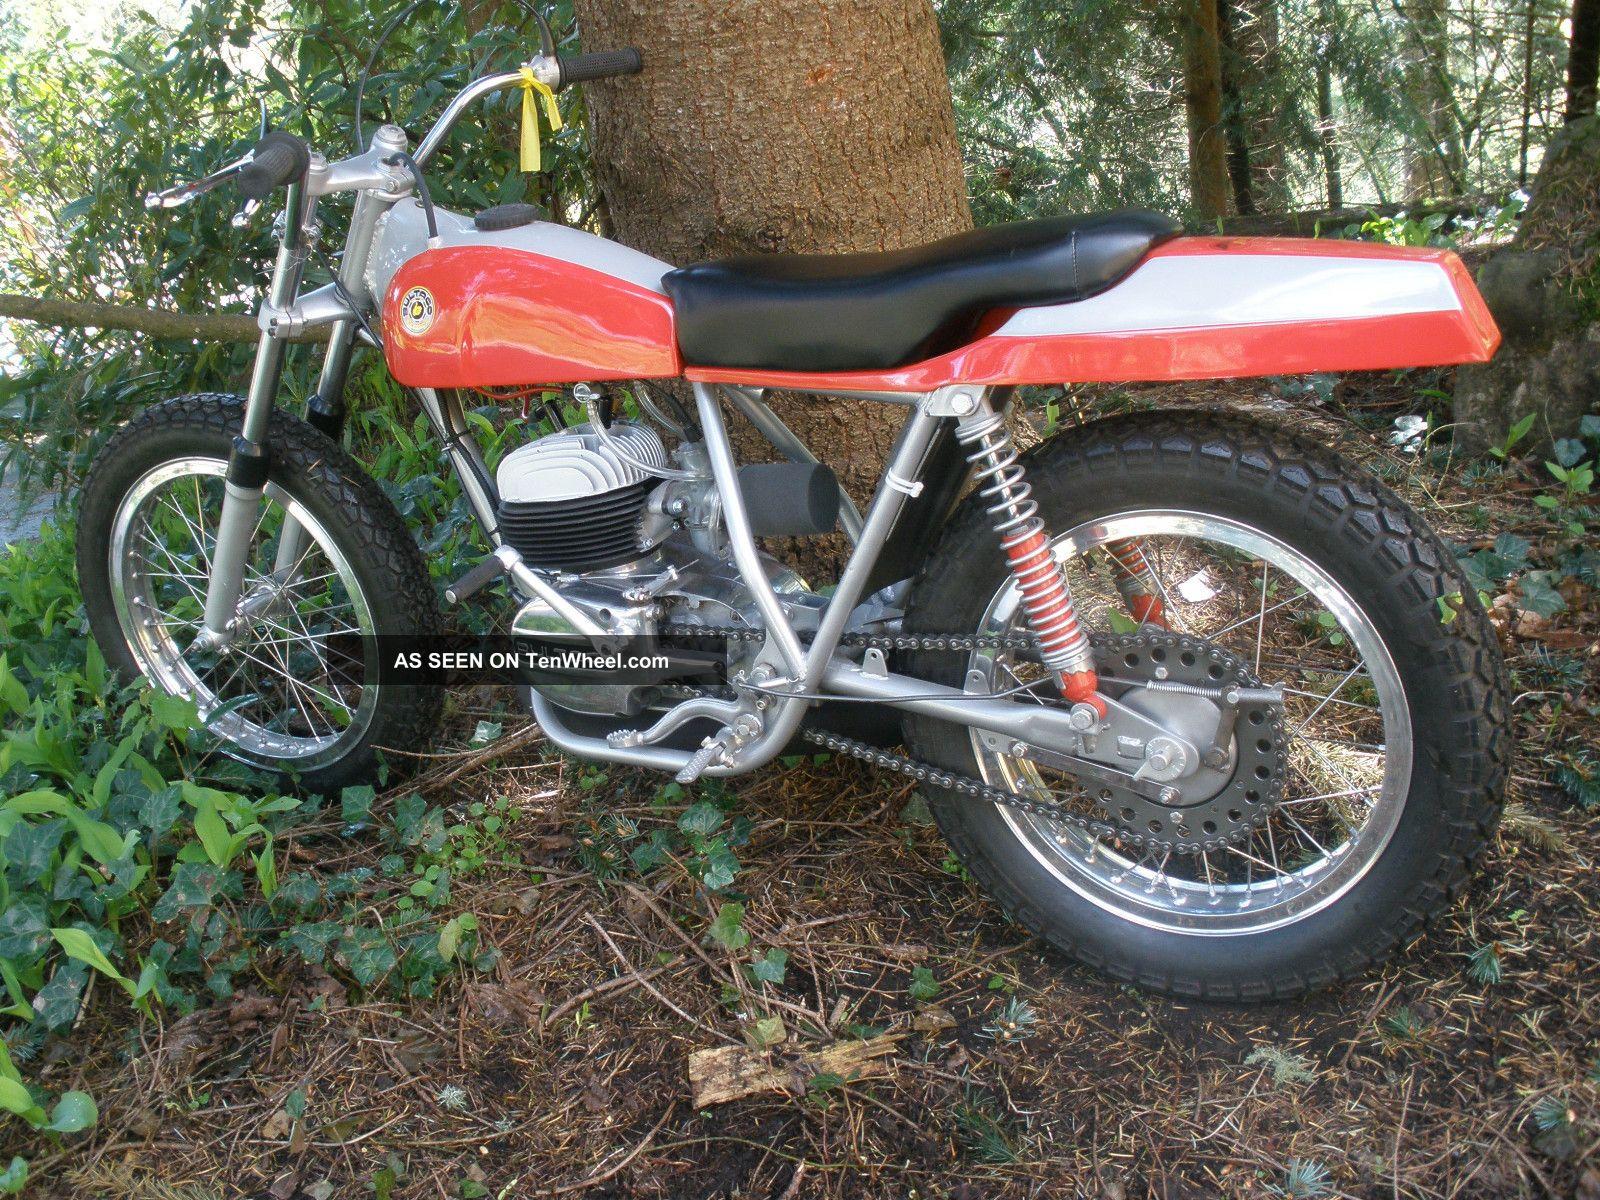 1968 Bultaco Pursang Boatail Flat Tracker - 100% Restored==== Gorgeous Bultaco photo